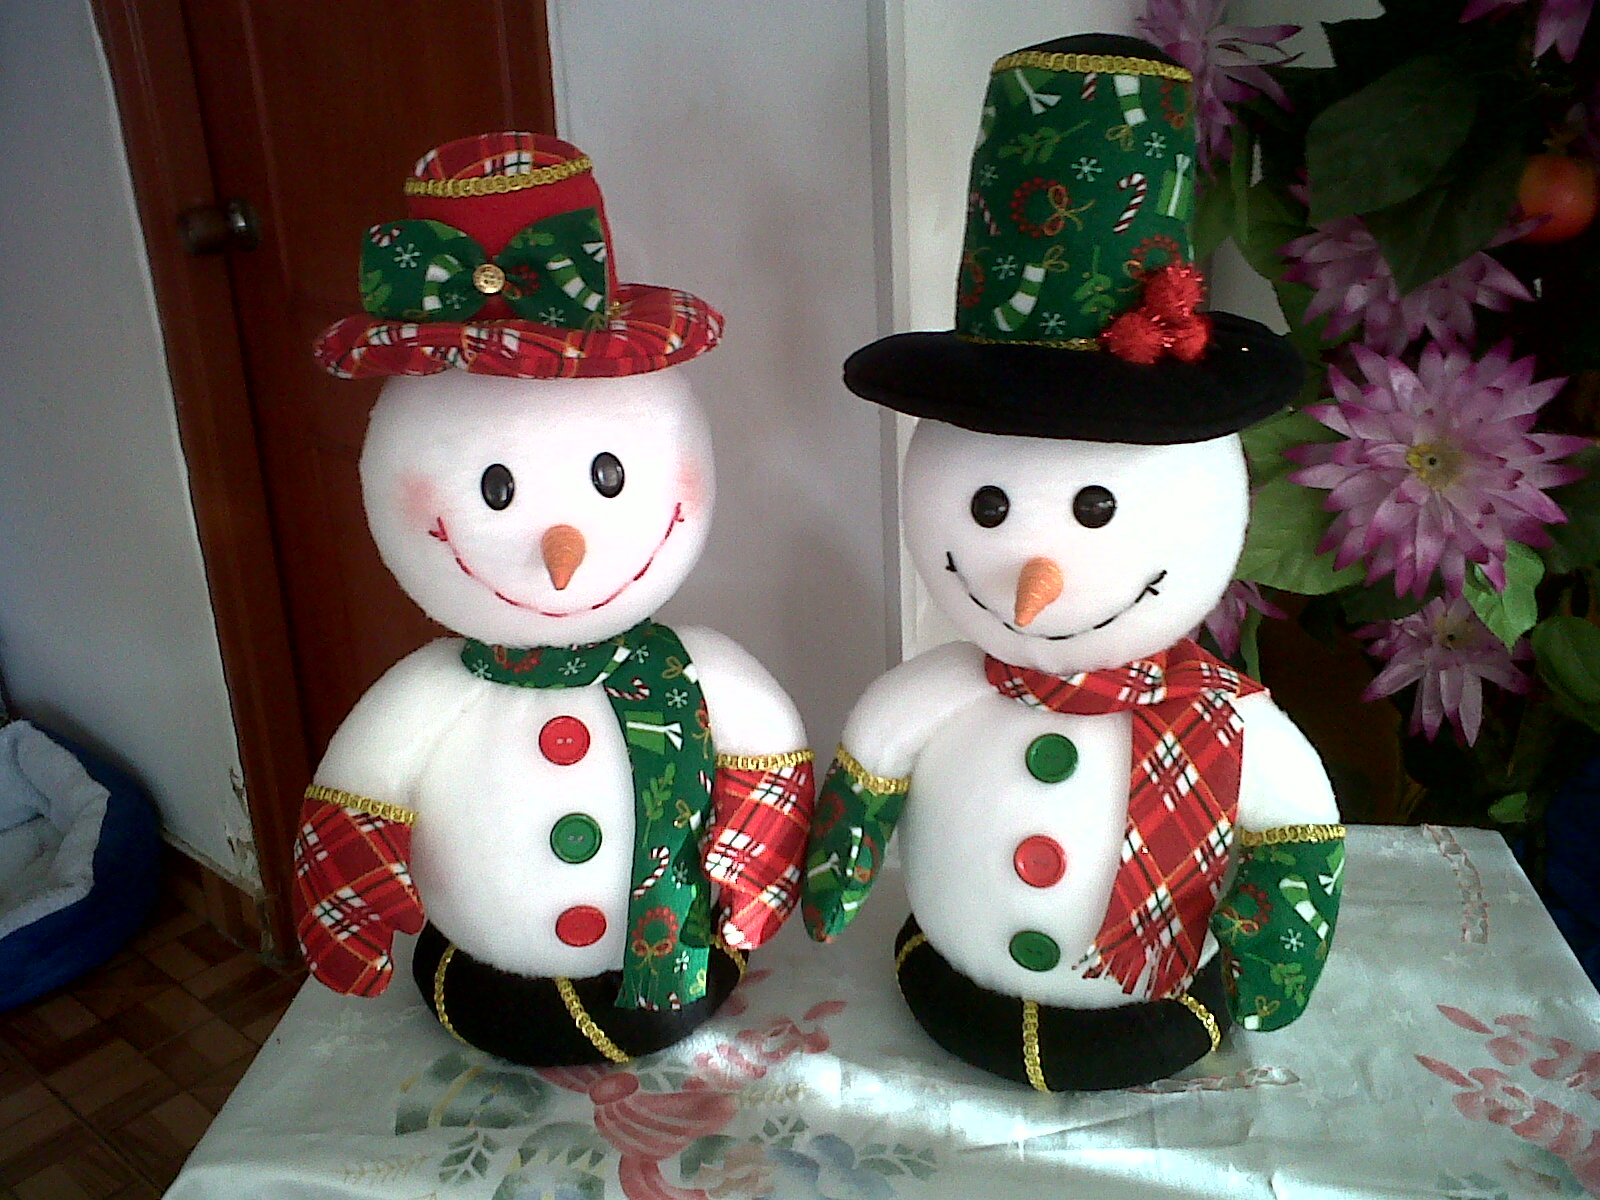 Nancy caballero sierra manualidades pao mu ecos de nieve - Como hacer figuras de navidad ...